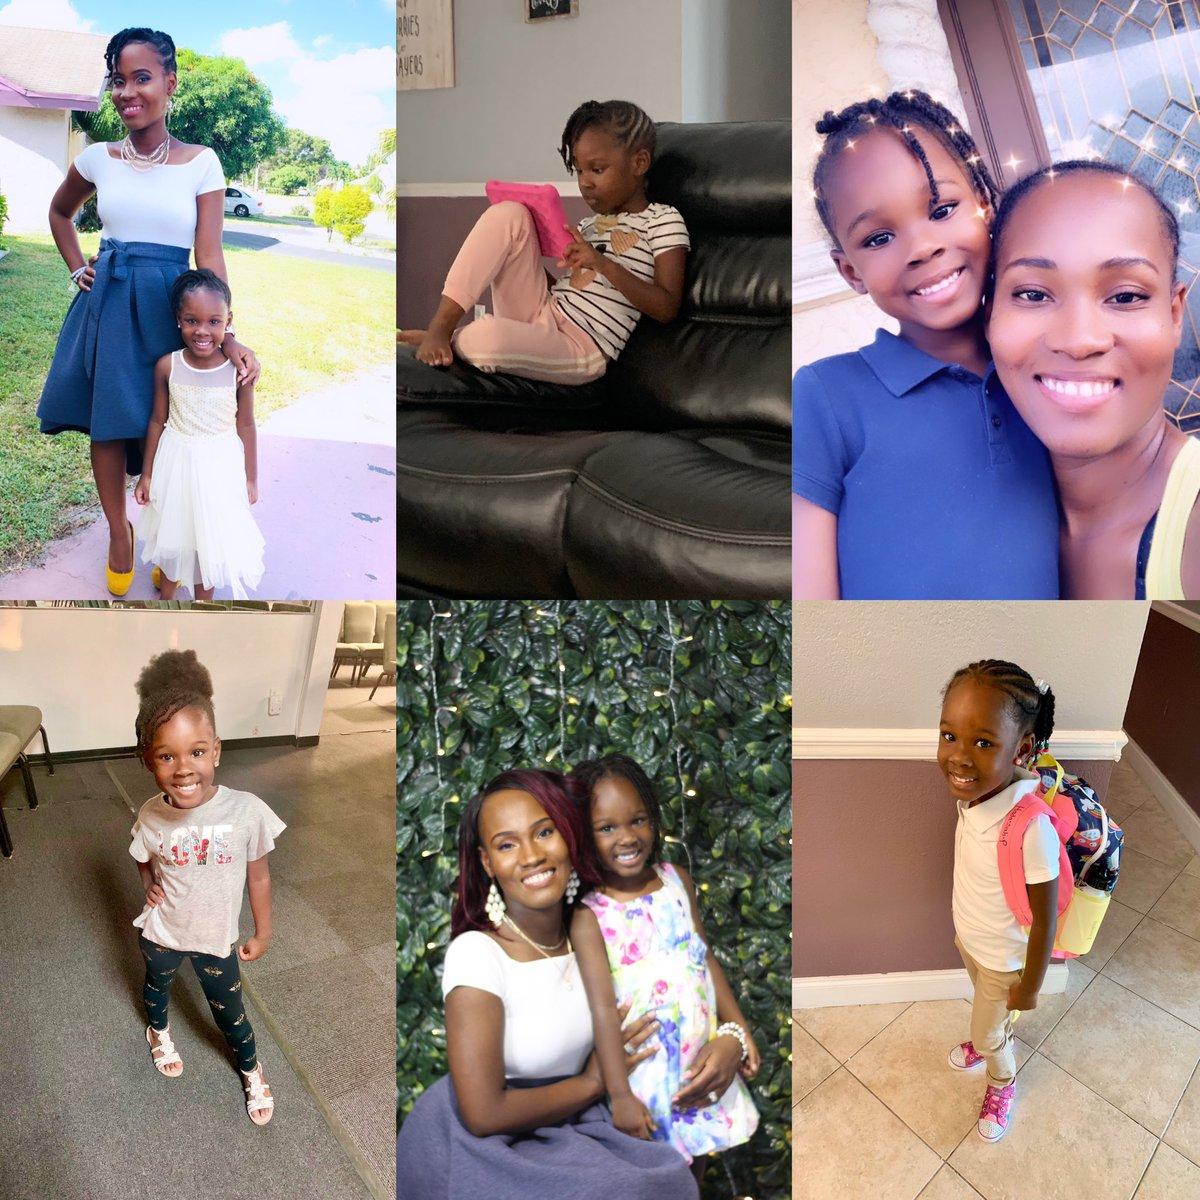 Happy 5th birthday to my first born 🎁🎉🎊 #mommasgirls #raisingqueens #momofgirls #brownskingirls #naturalhairgirls #blackgirlmagic #blackgirls #blackgirlsrocks #prettybrownskingirl #beautyandbrains #godfearing #blackdaughters #haitiangirlsrock #haitianprincess #birthdaygirl https://t.co/PJbZKgaQp5